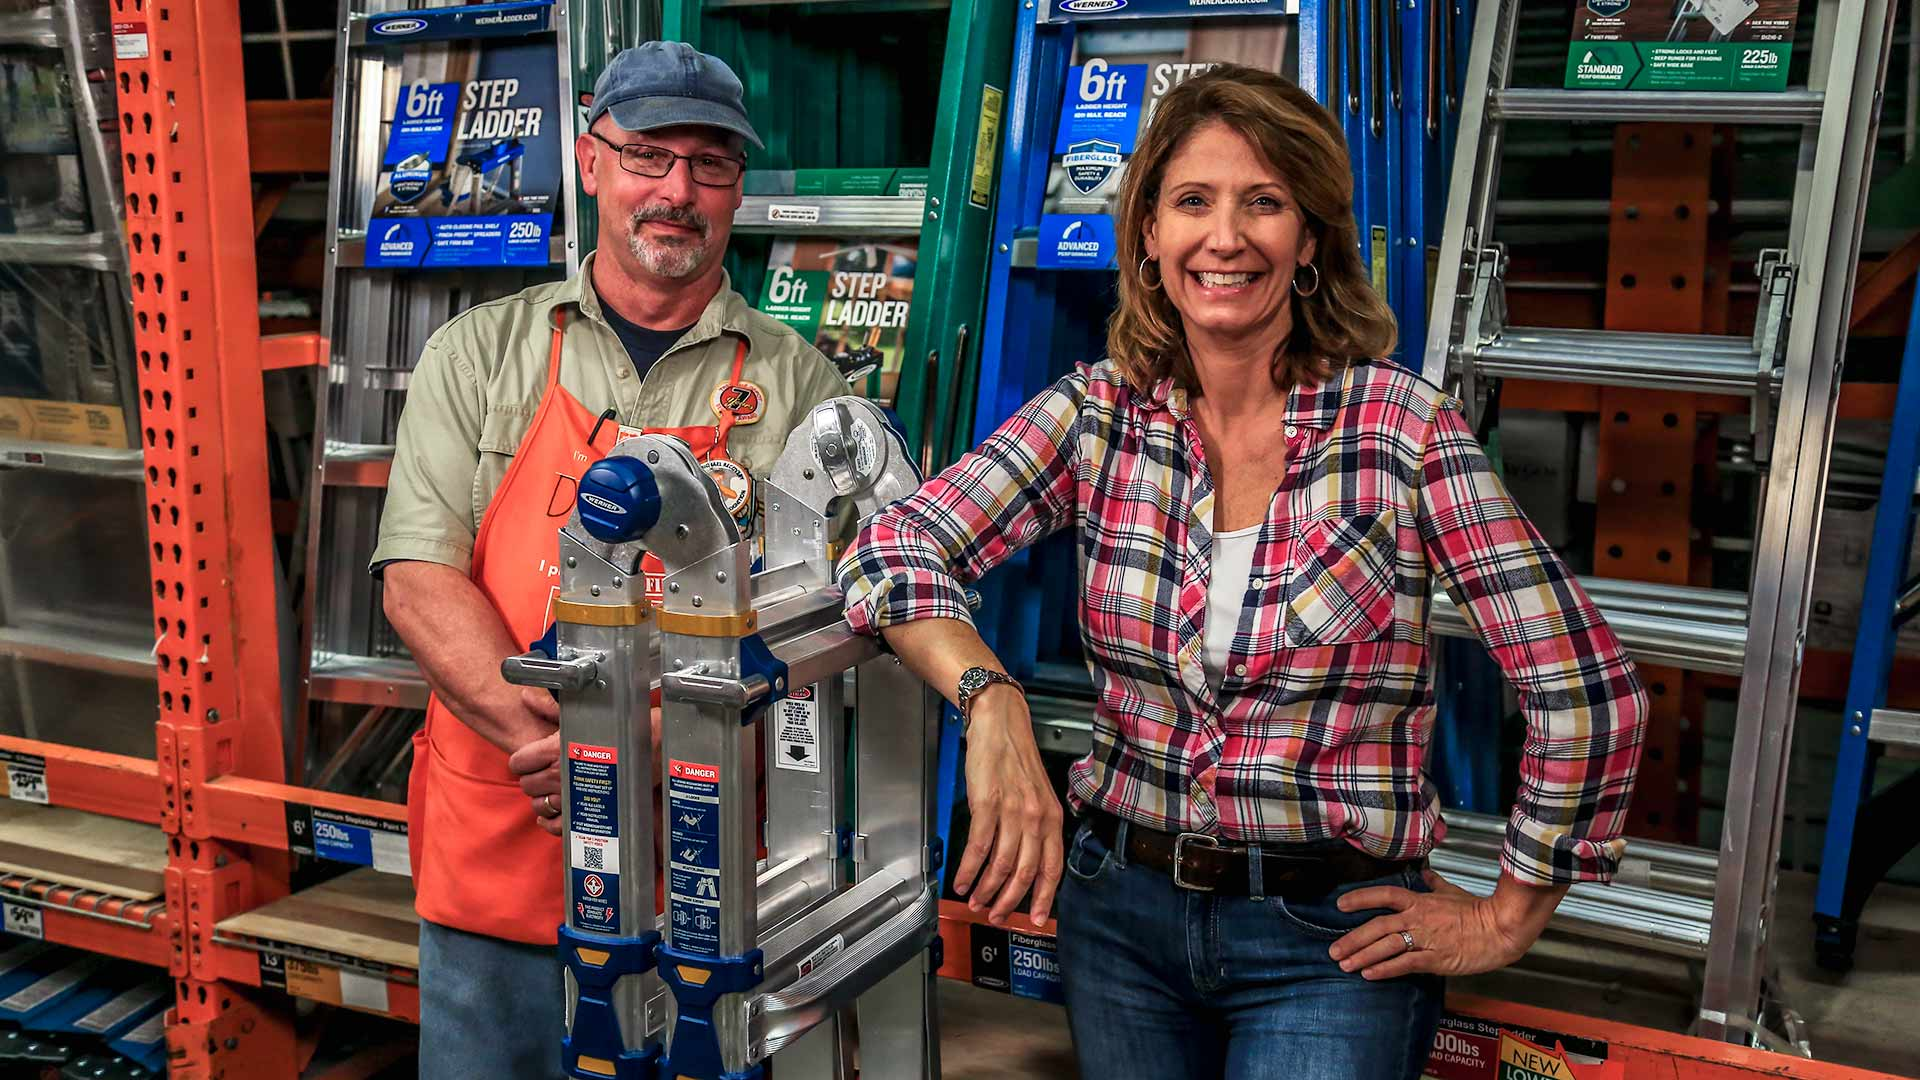 Jodi Marks and Dan display Werner's multi-position ladder